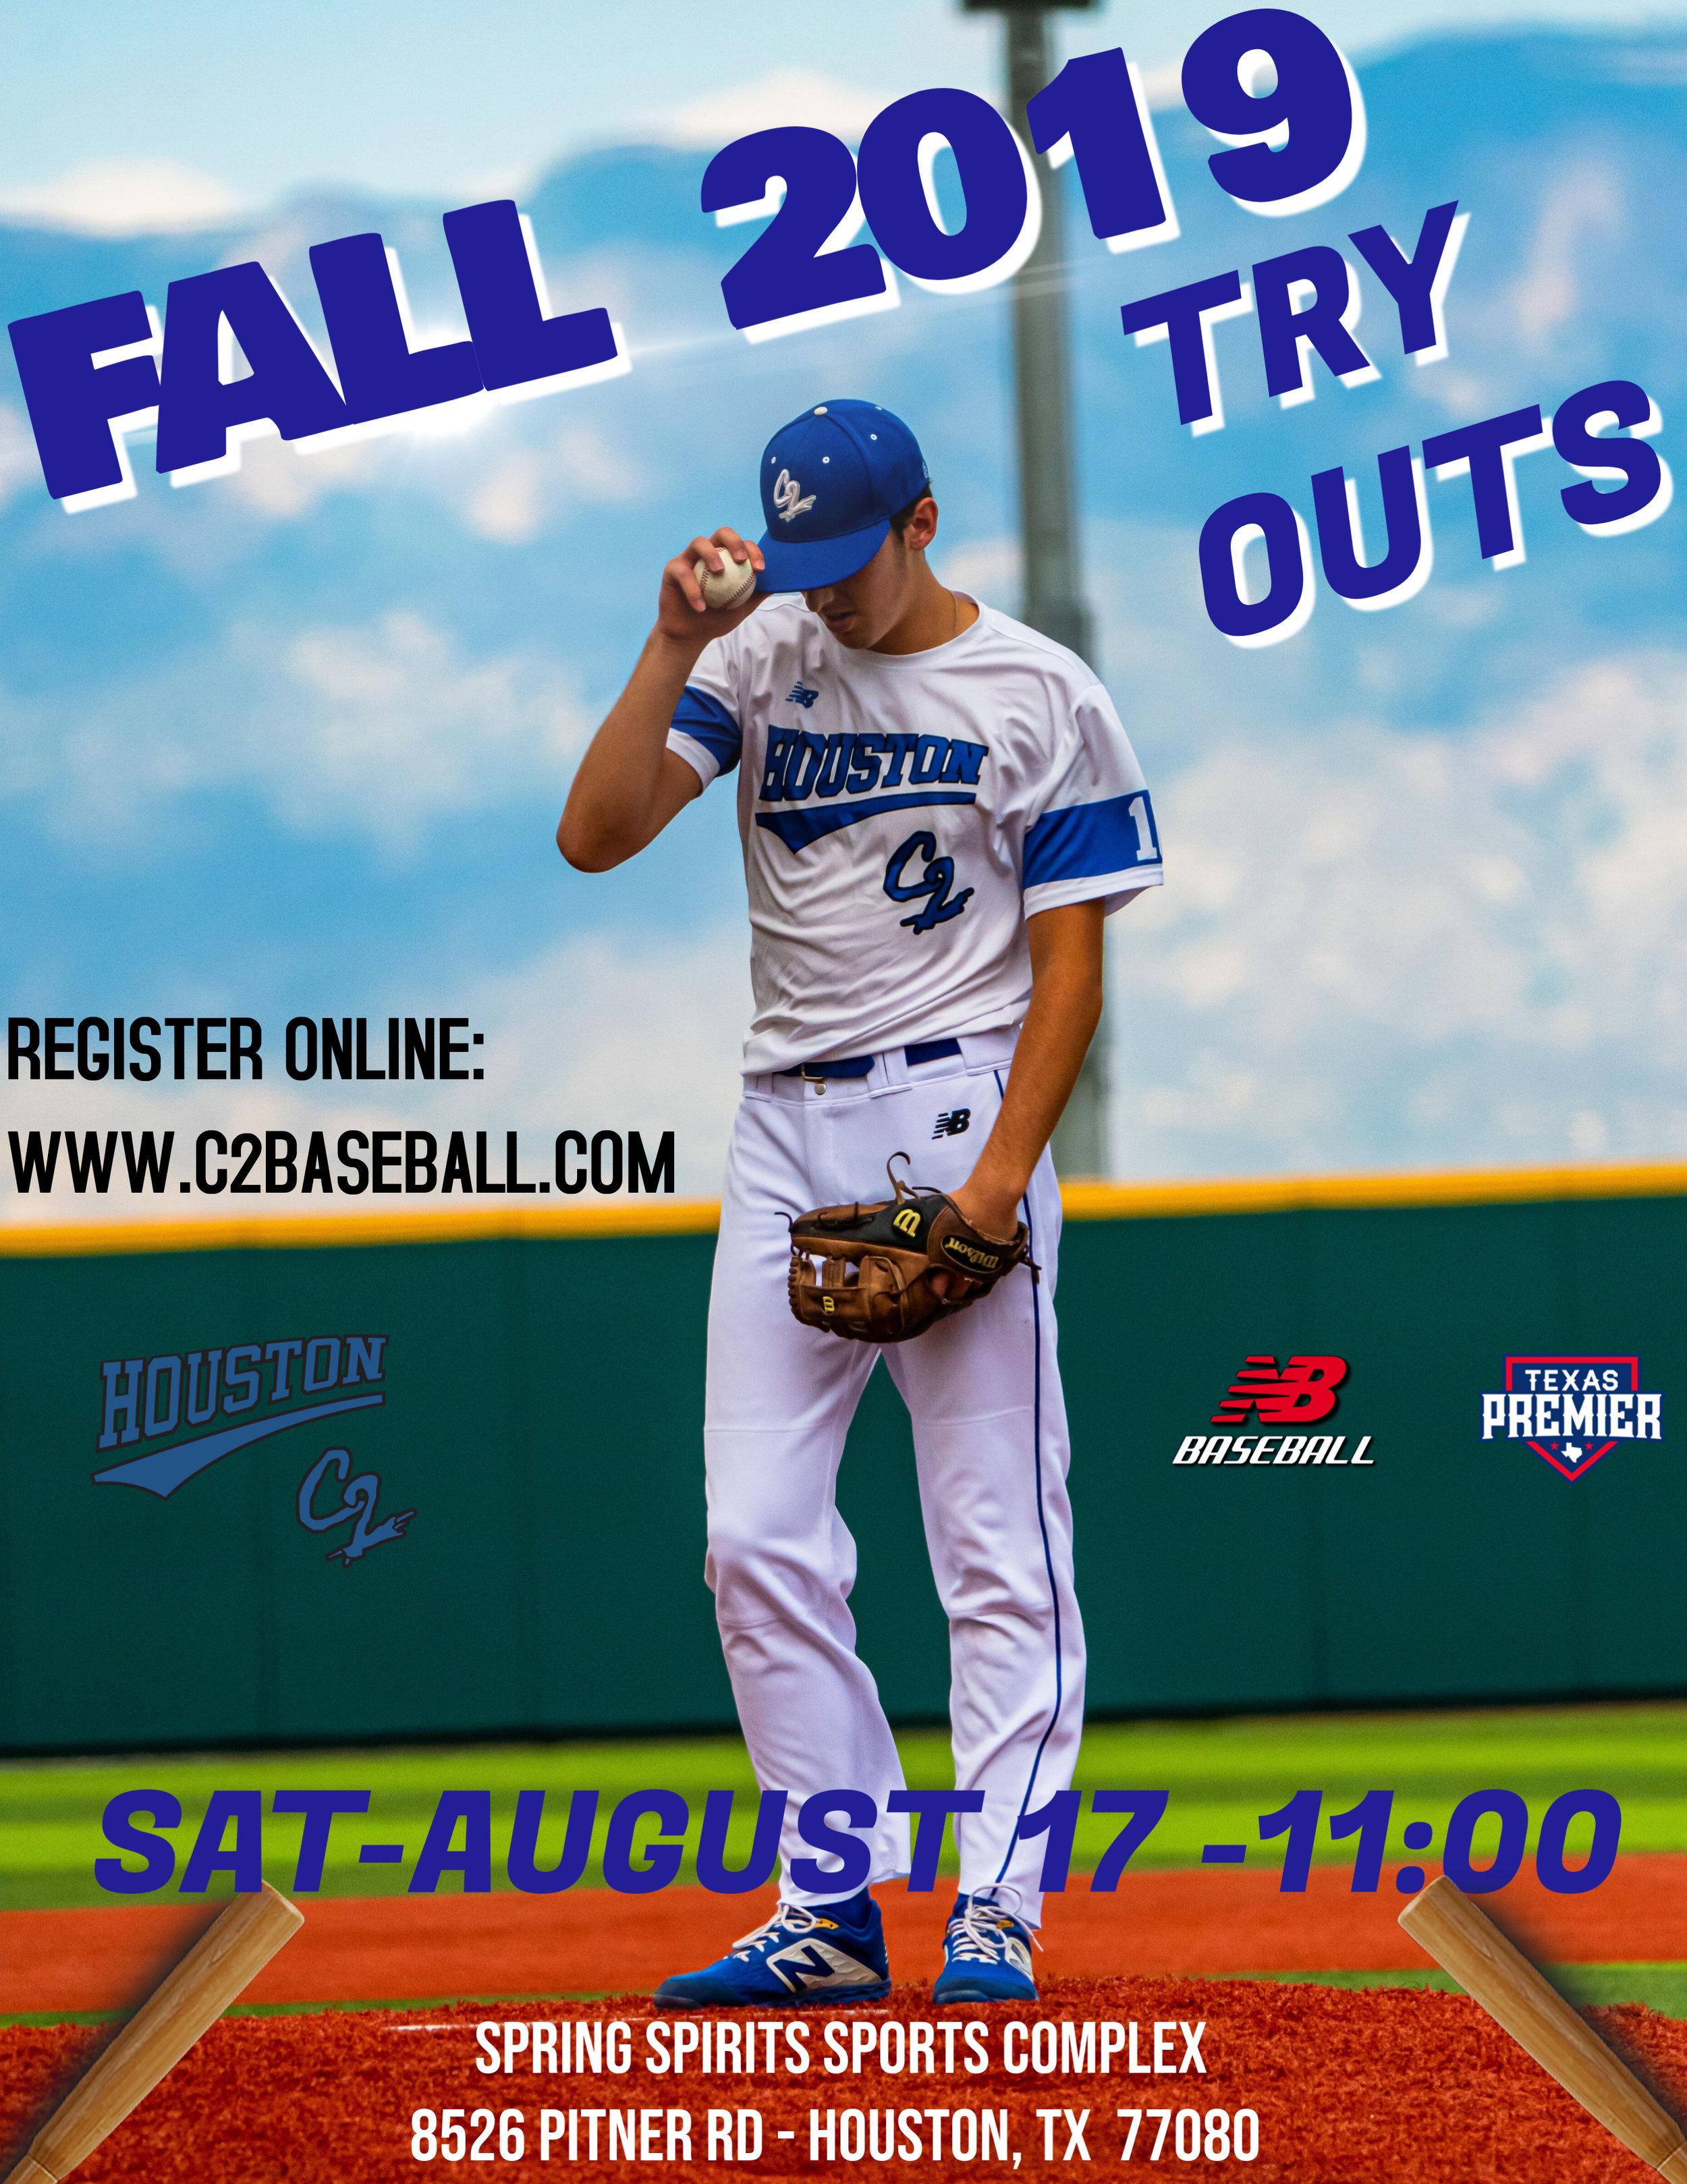 FINAL Copy of Baseball Game Flyer Poster.jpg